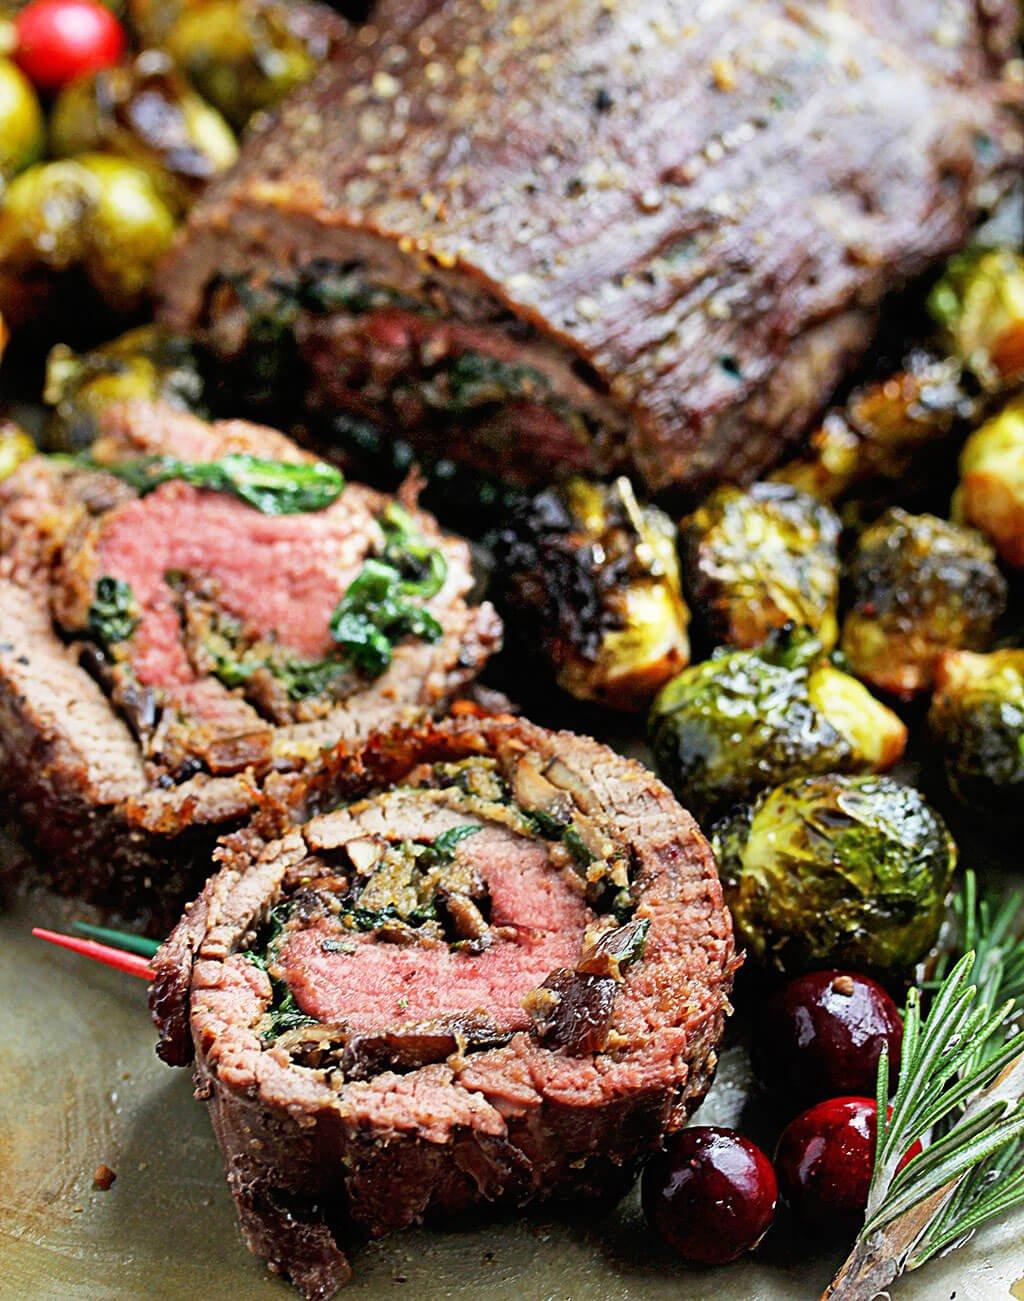 9.Mushroom and Spinach Stuffed Flank Steak